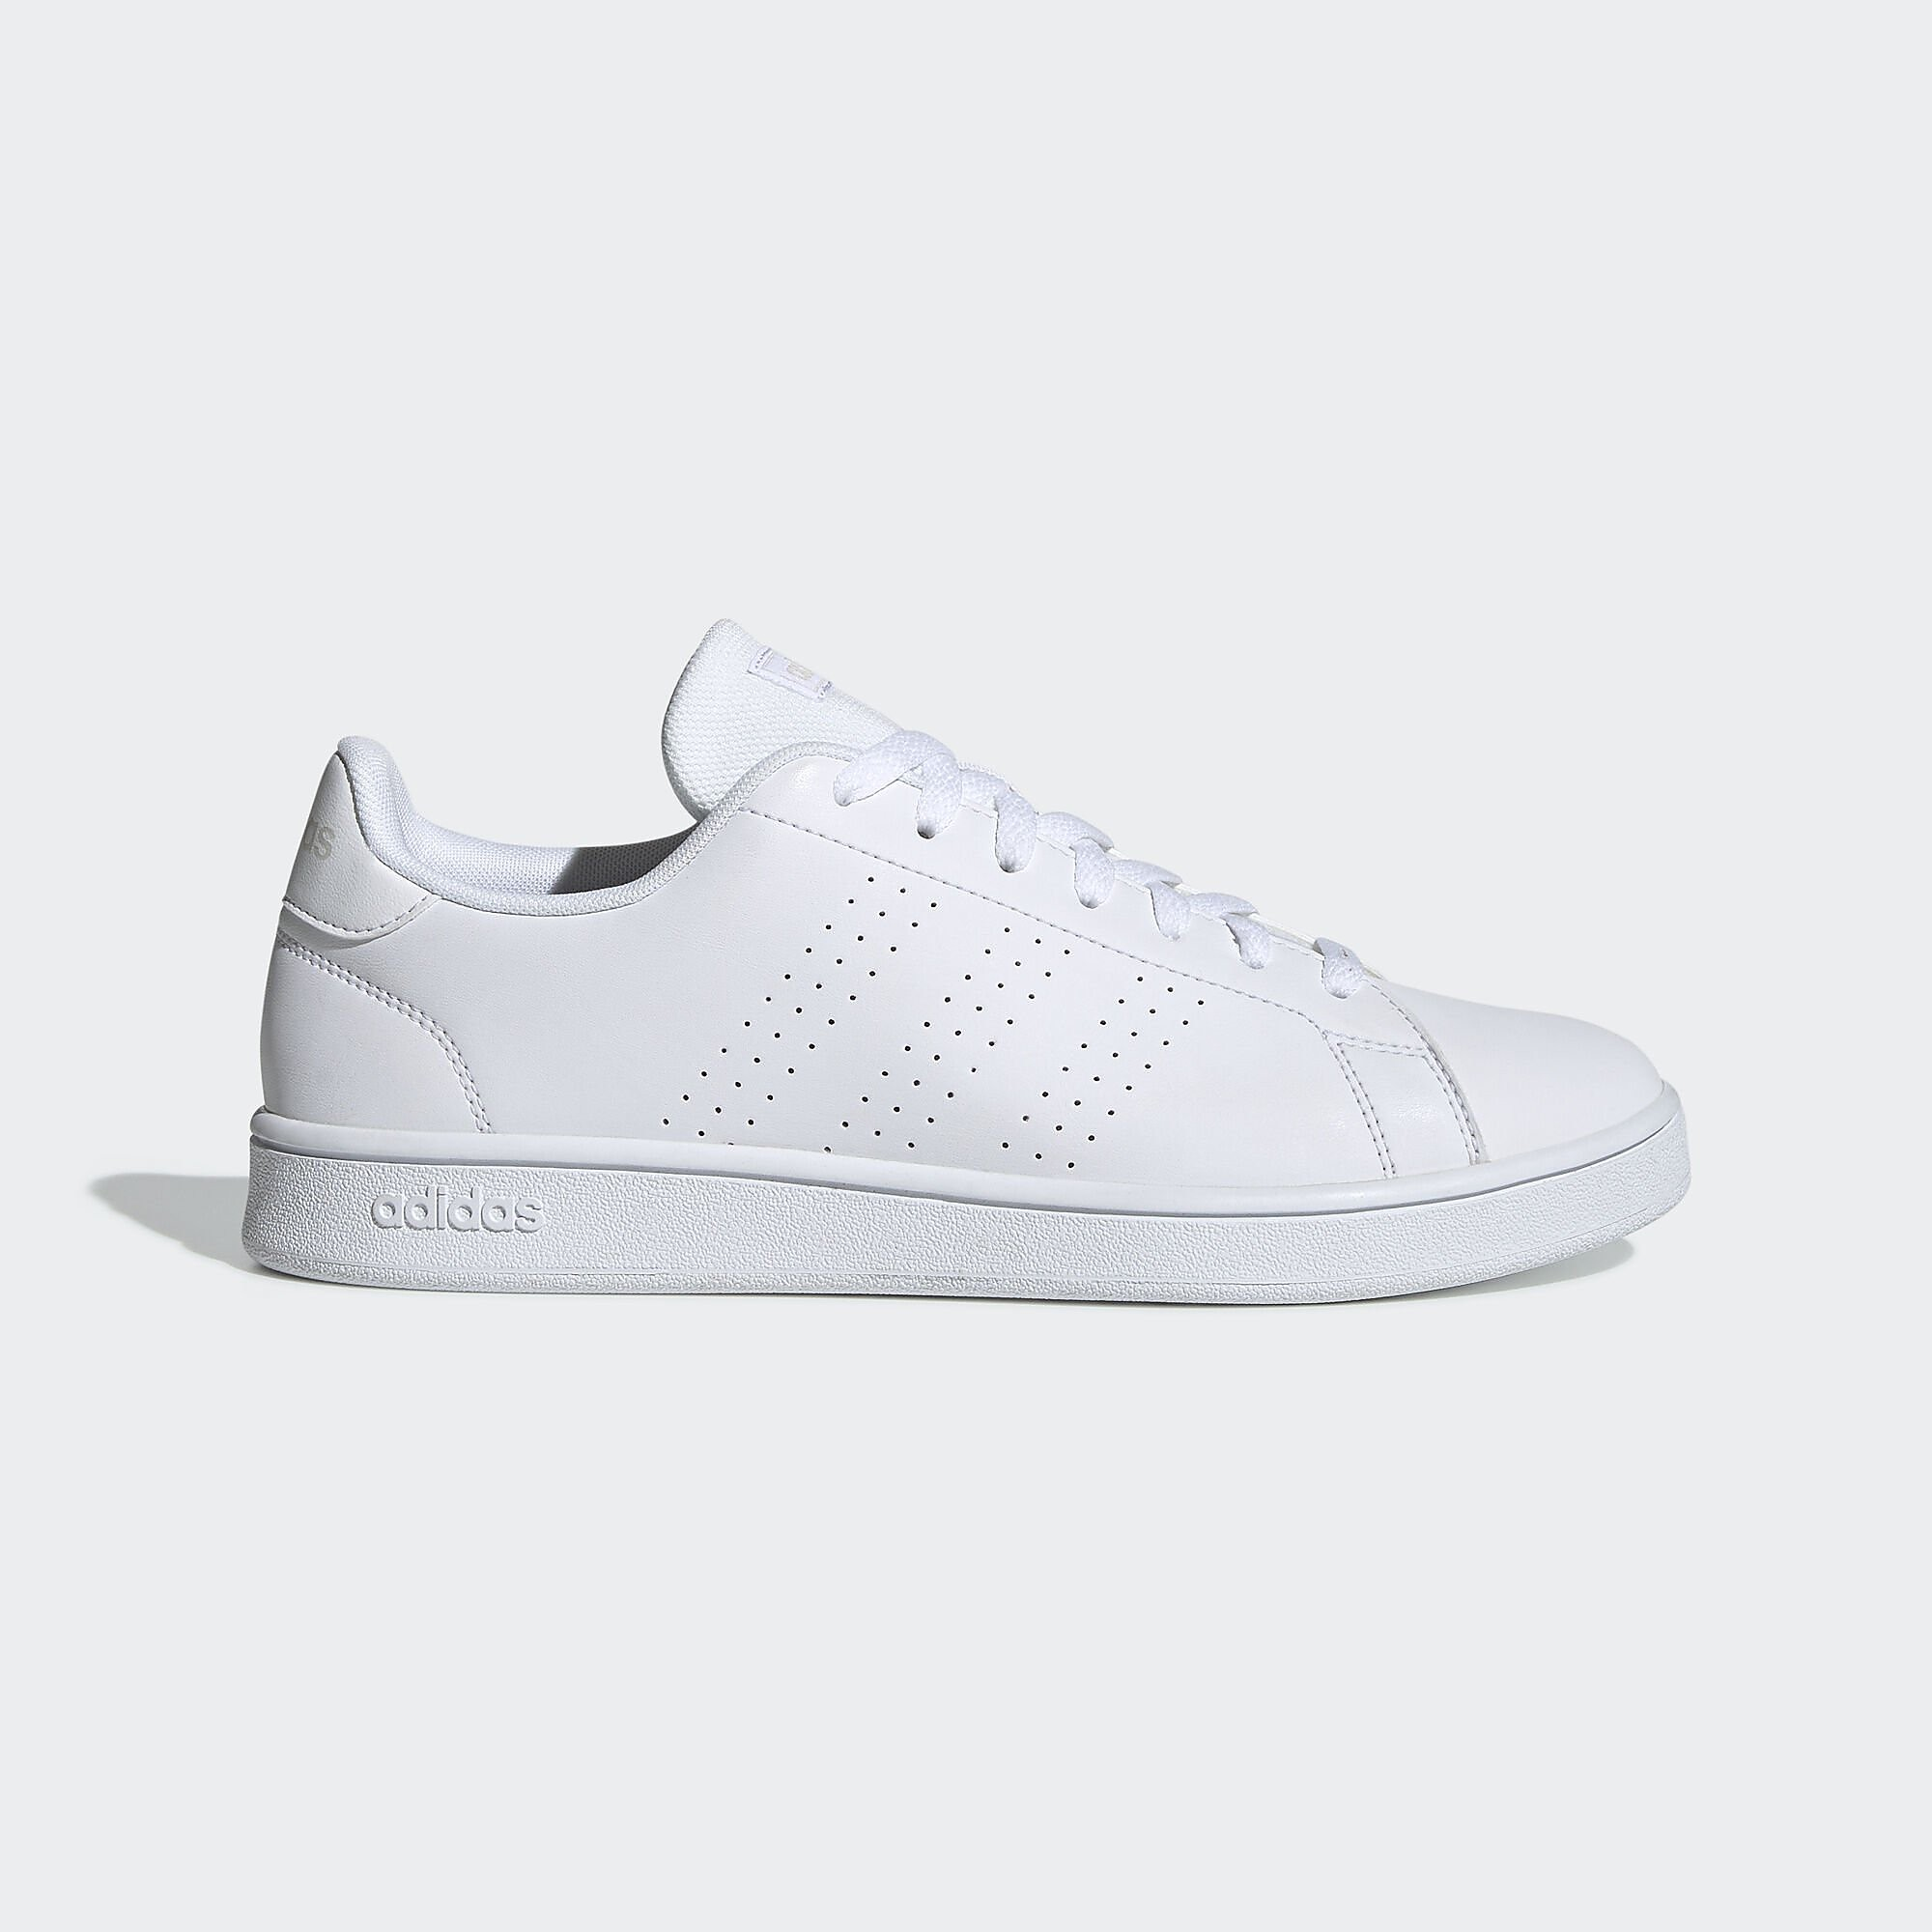 Adidas advantage base schoenen heren online kopen